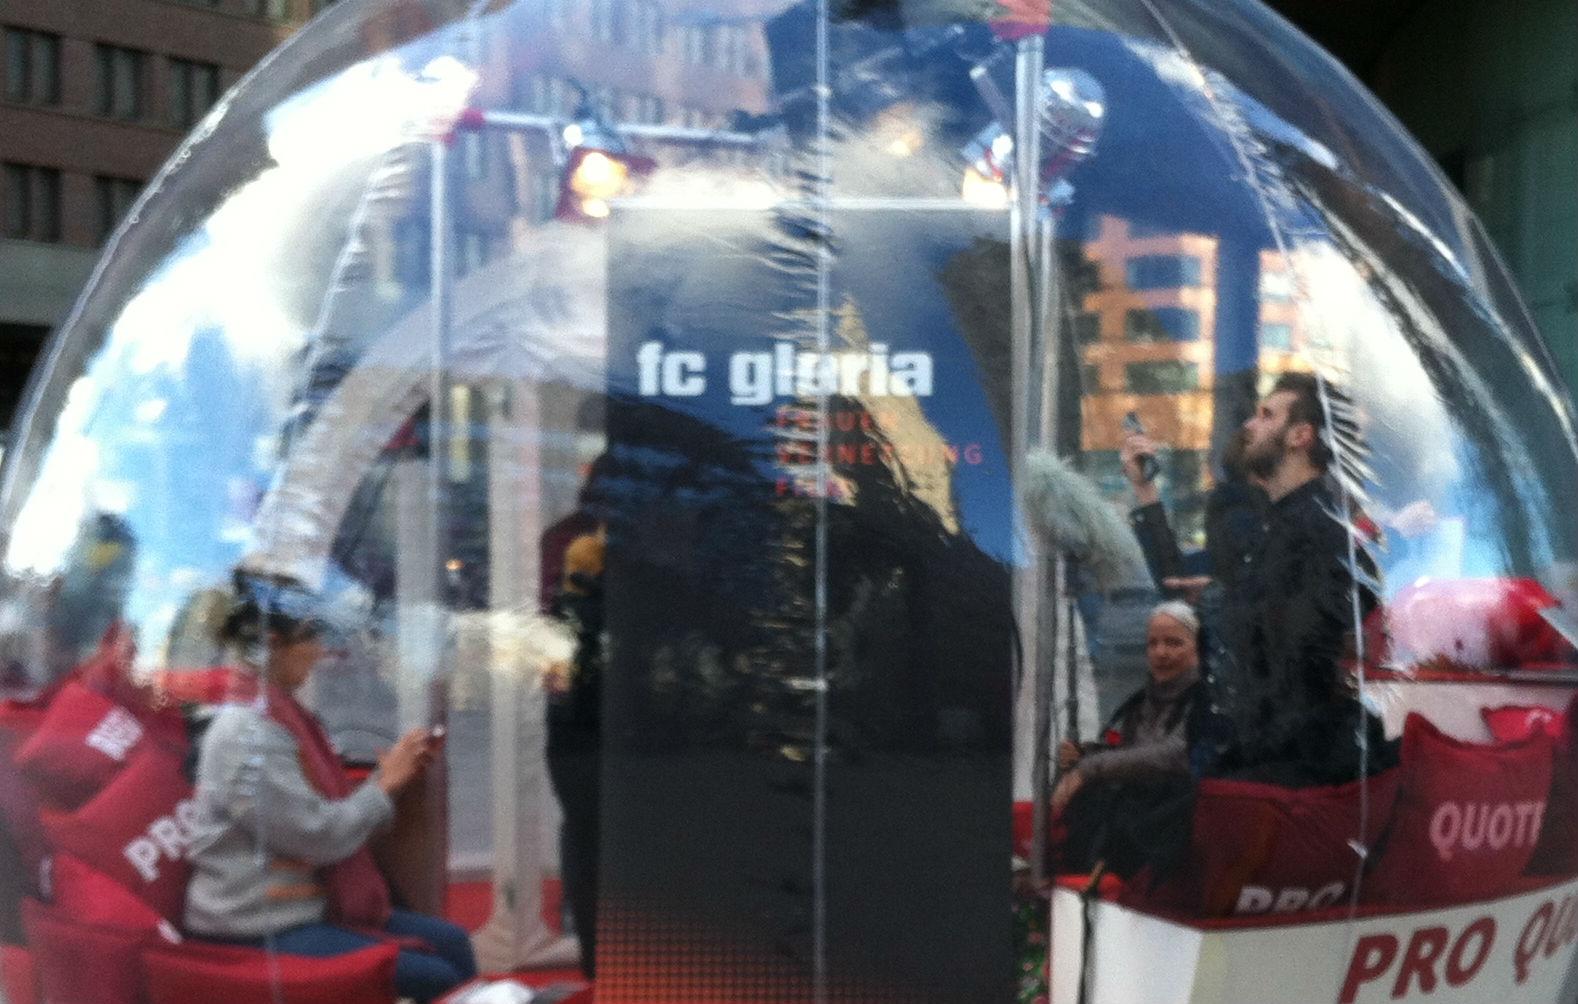 FC GLORIA @ Berlinale in der PRO QUOTE REGIE Bubble